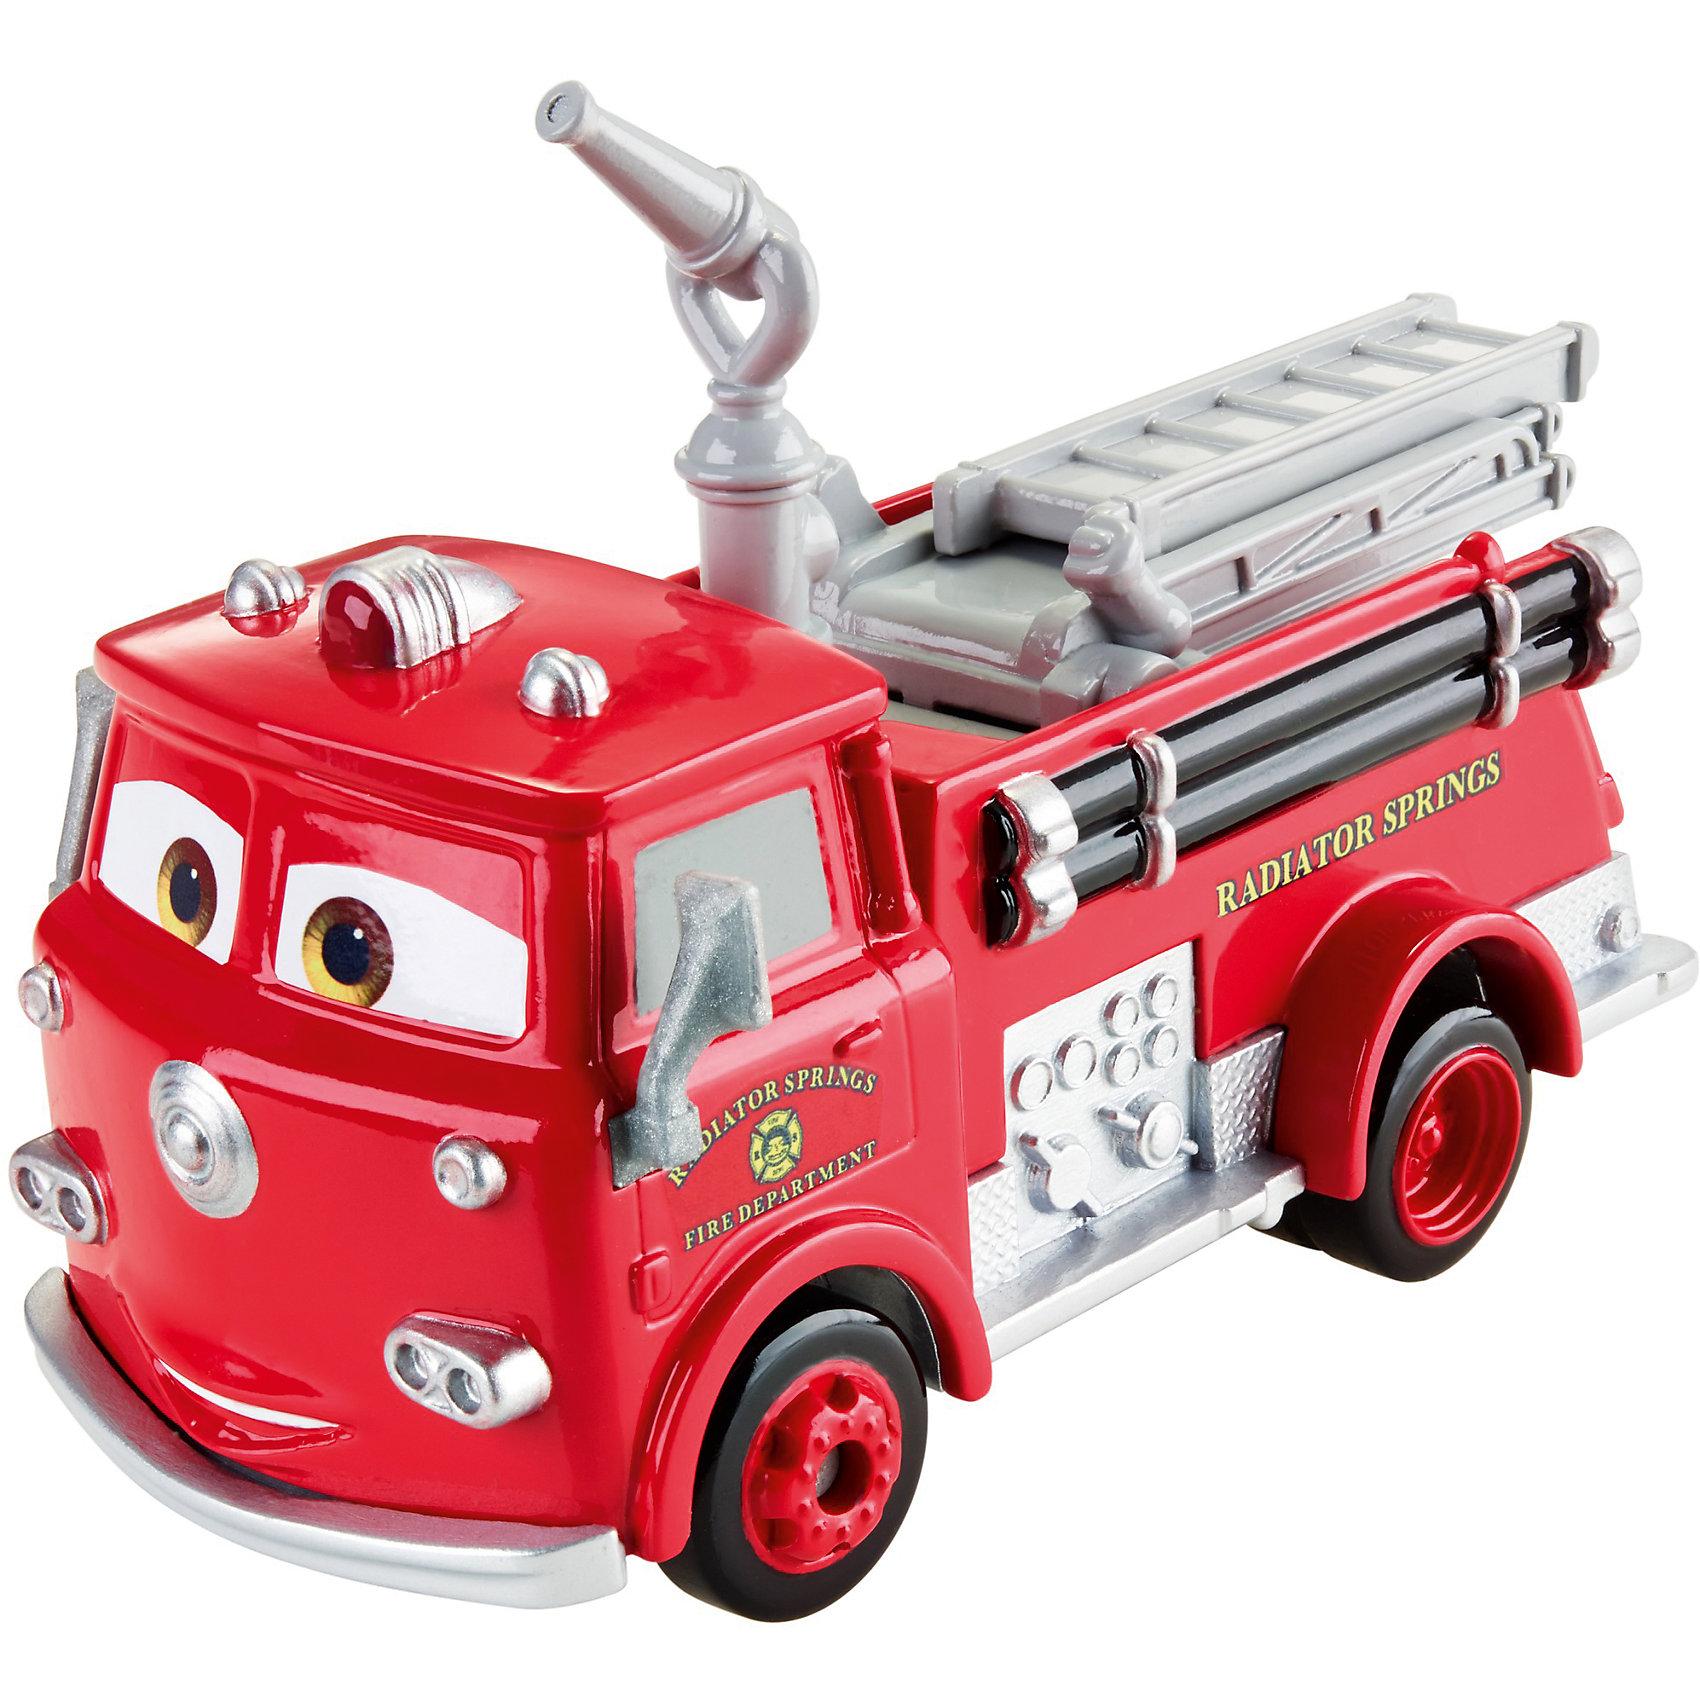 Пожарная машина, ТачкиМашинки<br><br><br>Ширина мм: 165<br>Глубина мм: 70<br>Высота мм: 190<br>Вес г: 419<br>Возраст от месяцев: 36<br>Возраст до месяцев: 120<br>Пол: Мужской<br>Возраст: Детский<br>SKU: 6882650